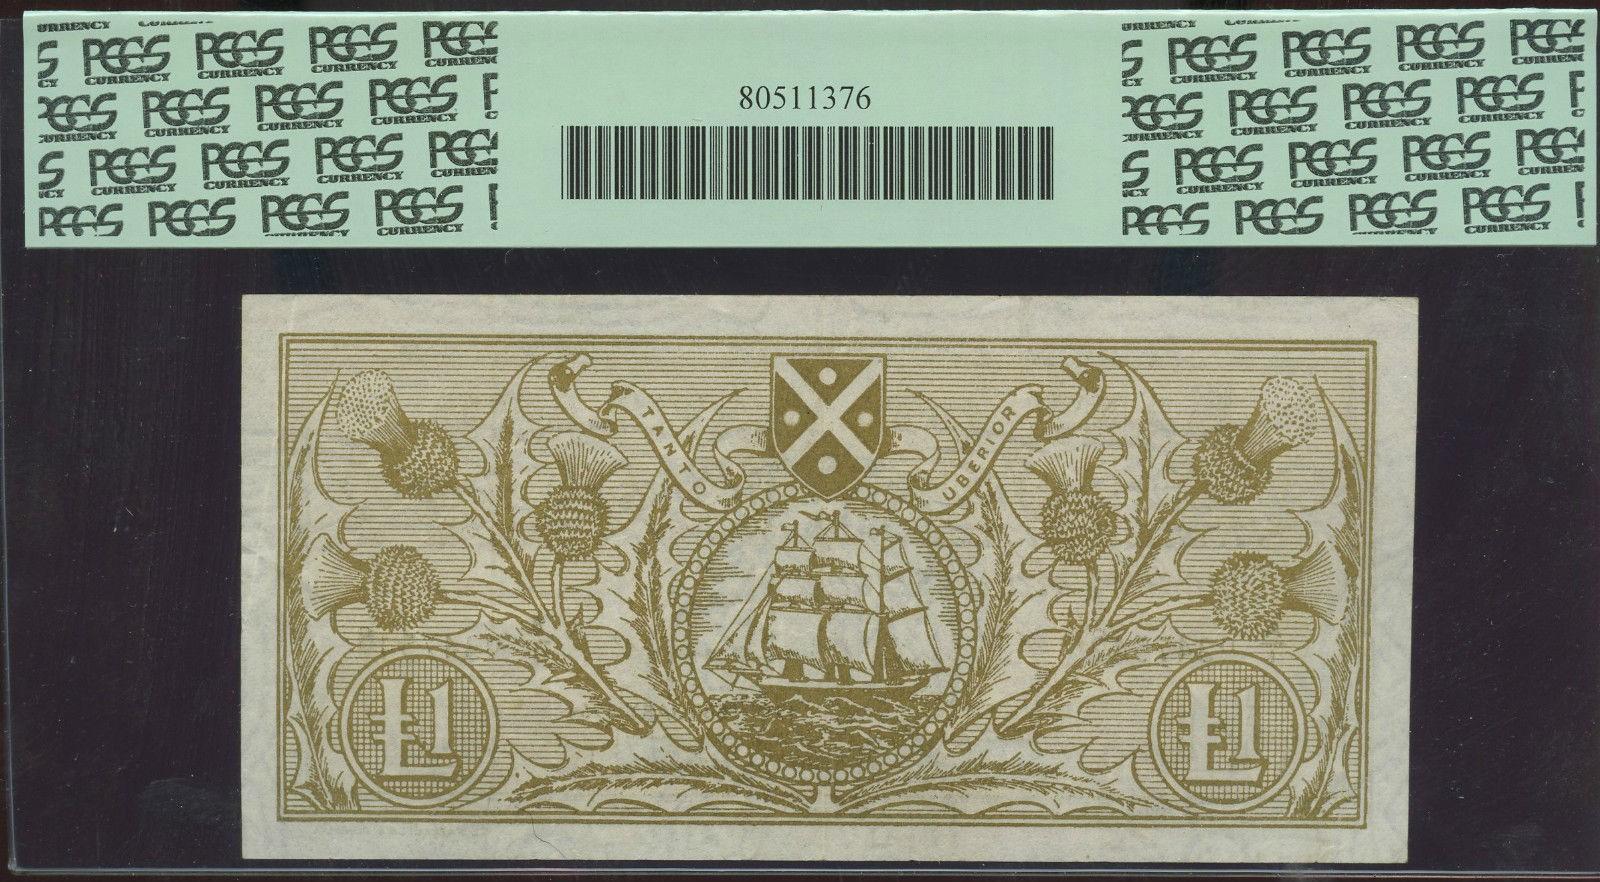 £1 1964 BANK OF SCOTLAND PICK 102a PCGS VF30 EXCELLENT $17.50 rev.jpg